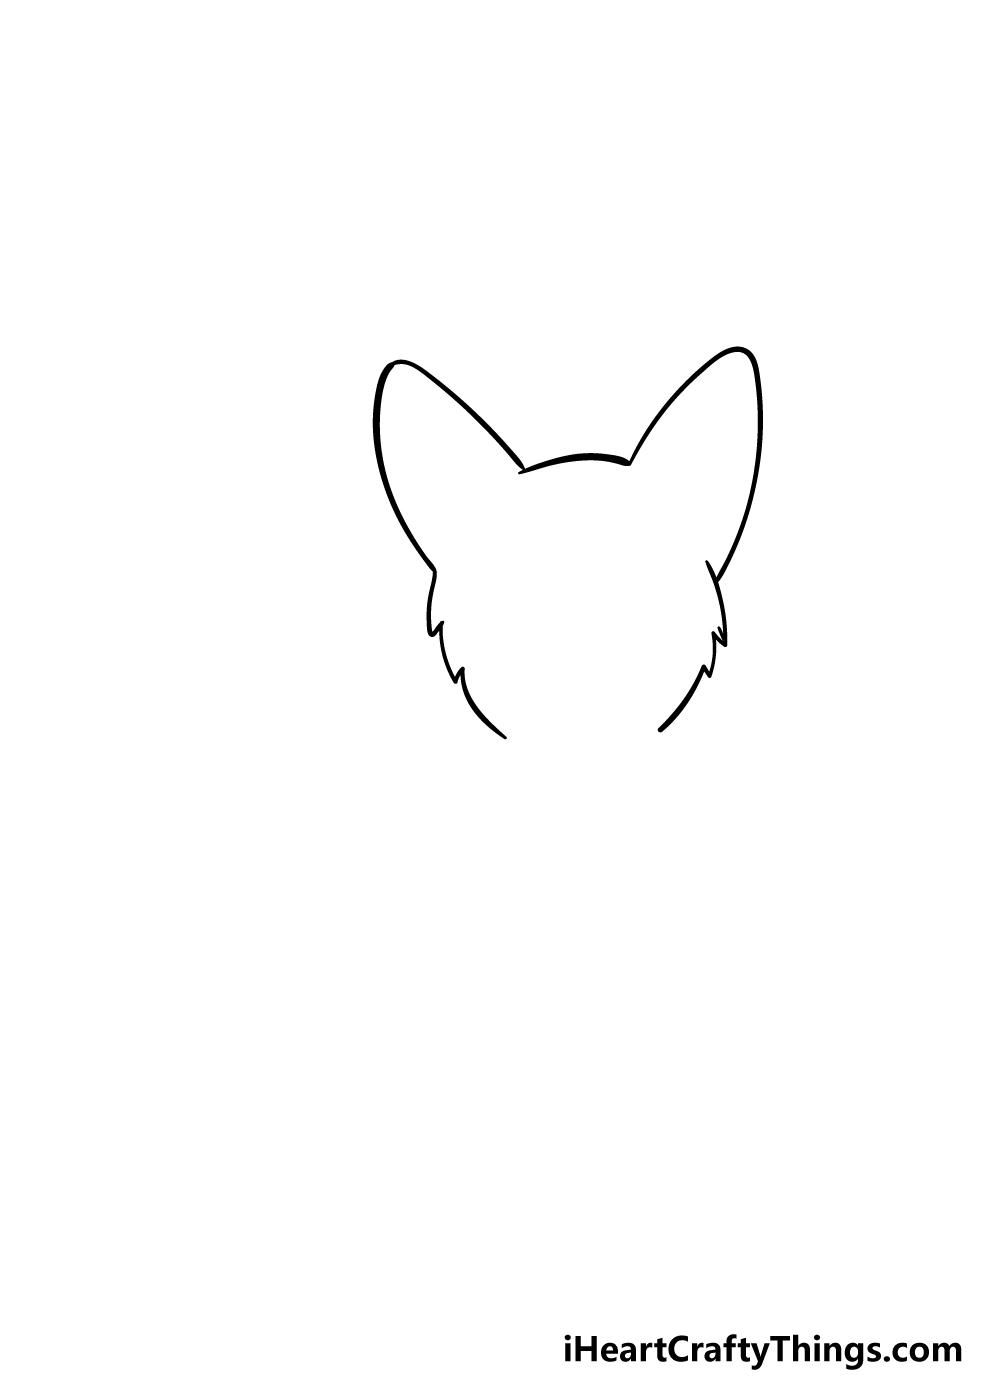 corgi drawing step 1